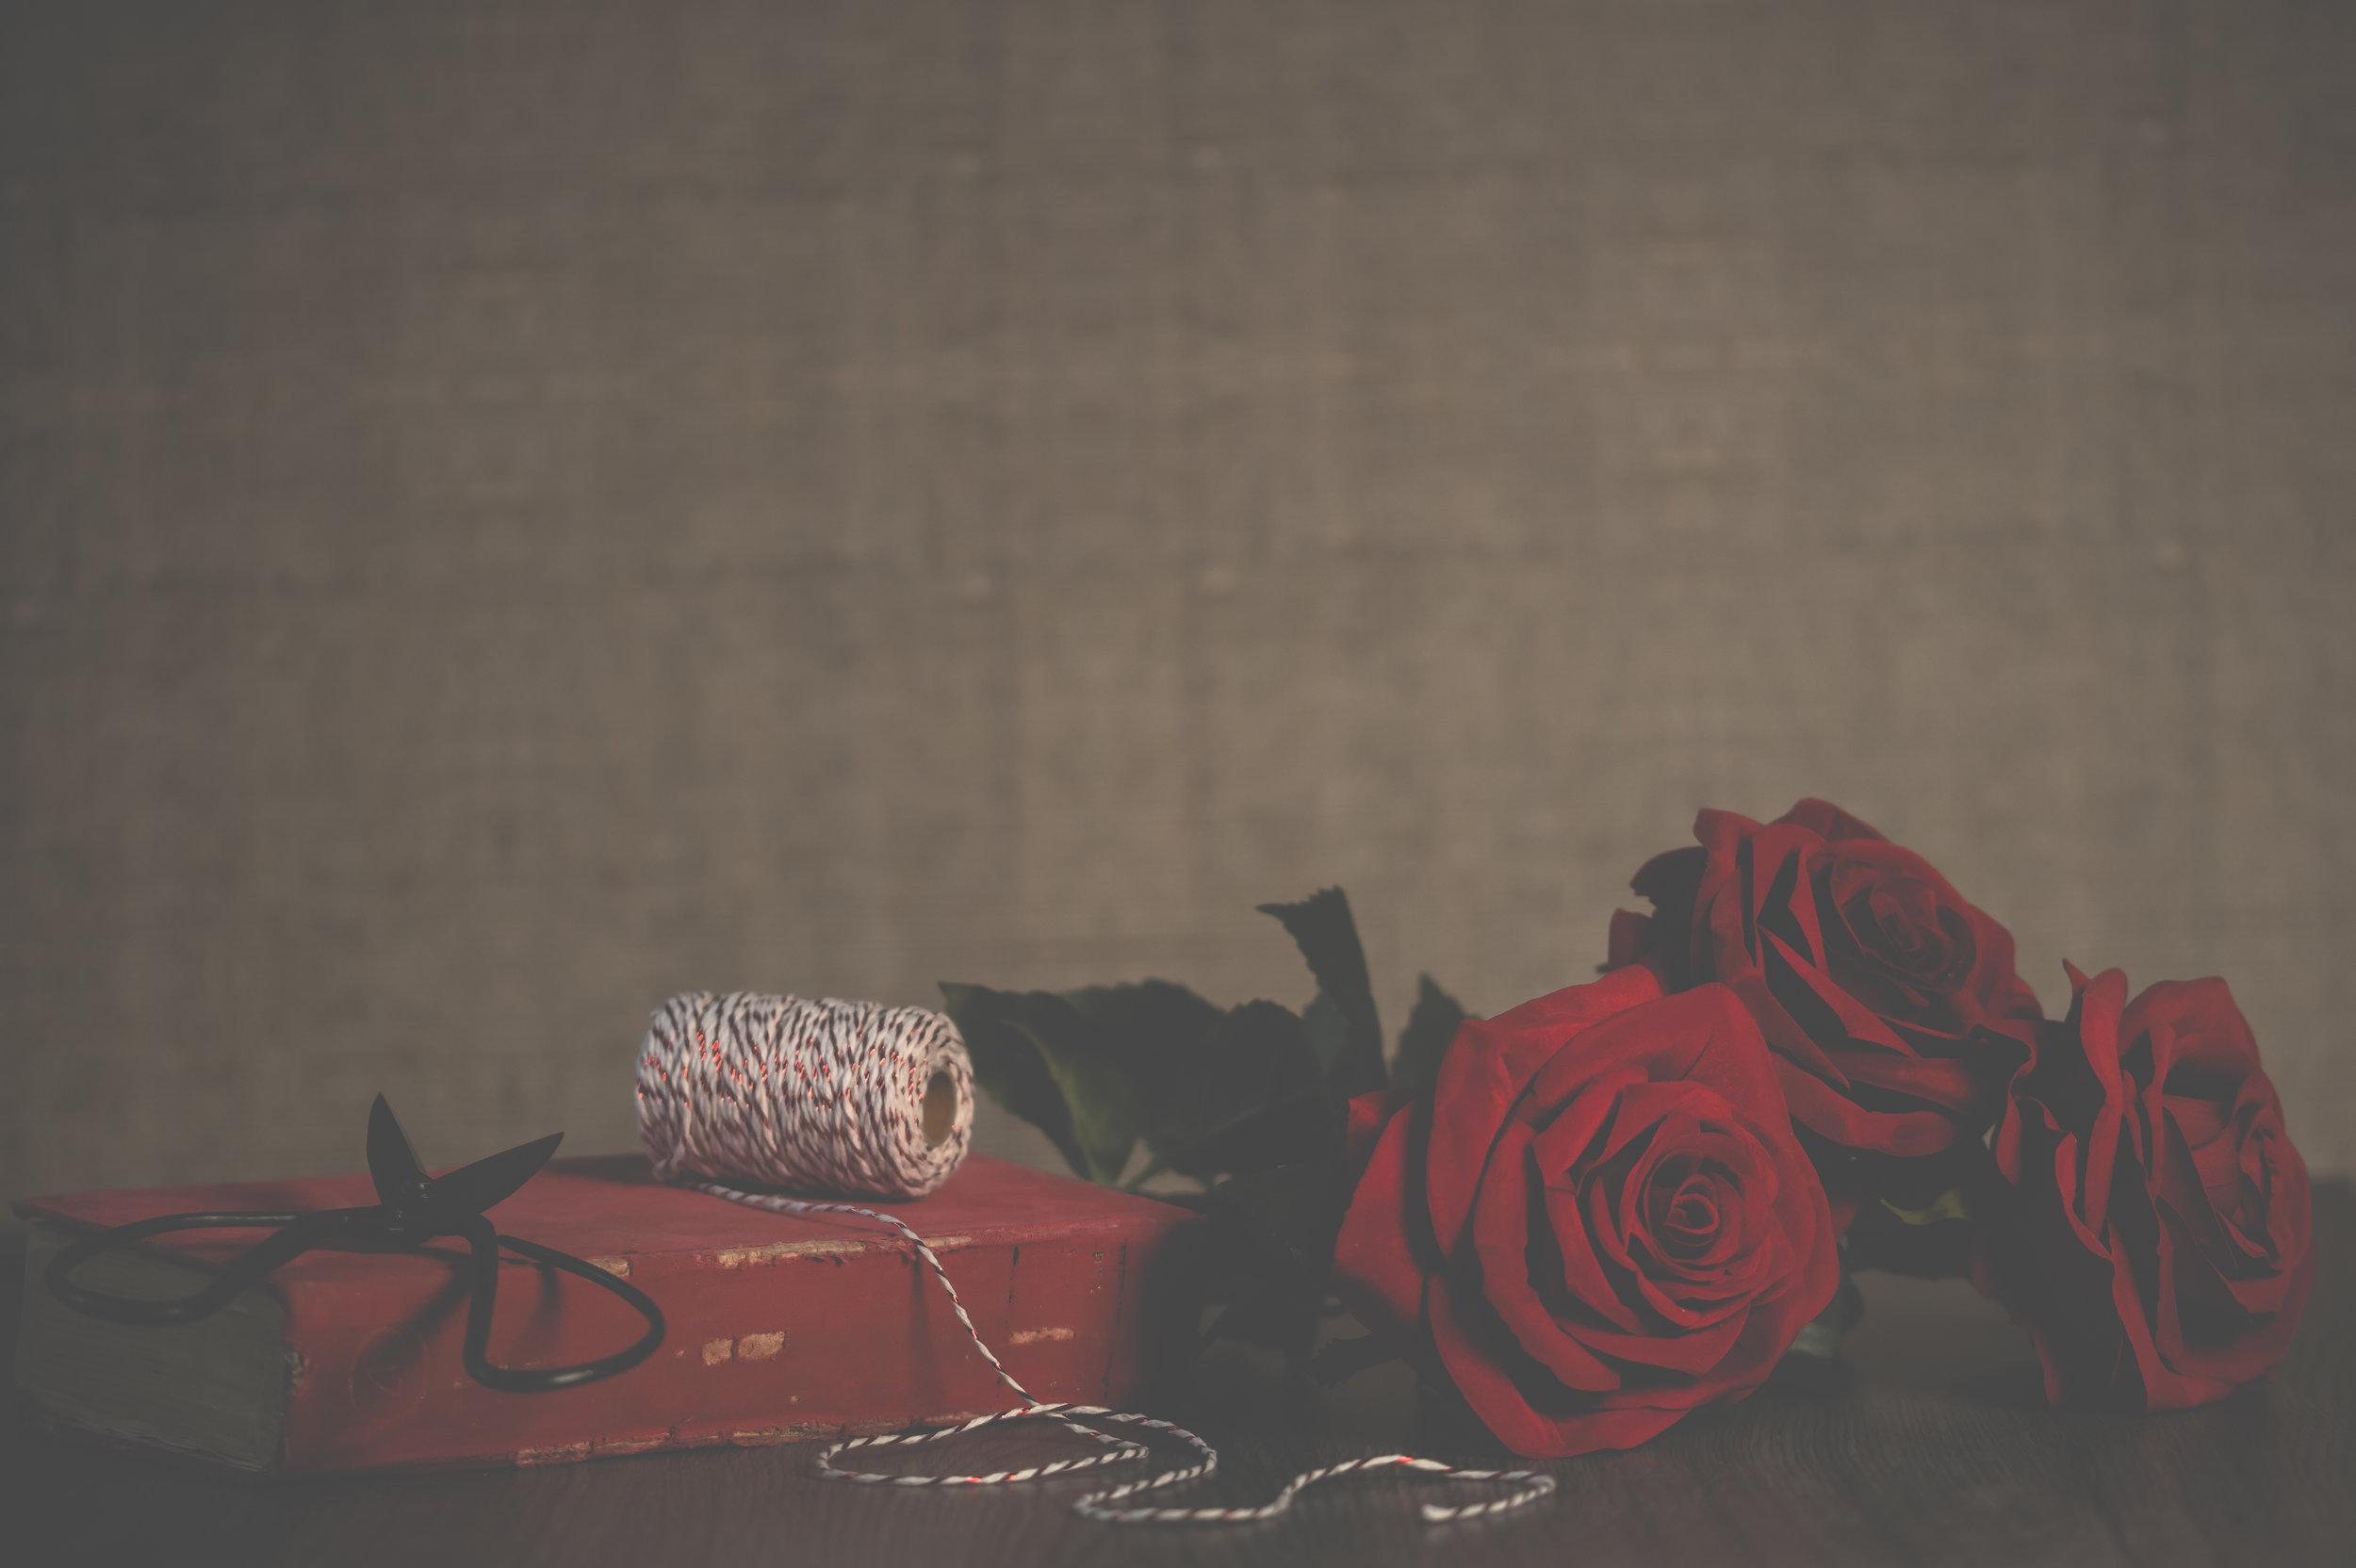 roses-rose-scissors-book-love-red-1418880-pxhere.com.jpg